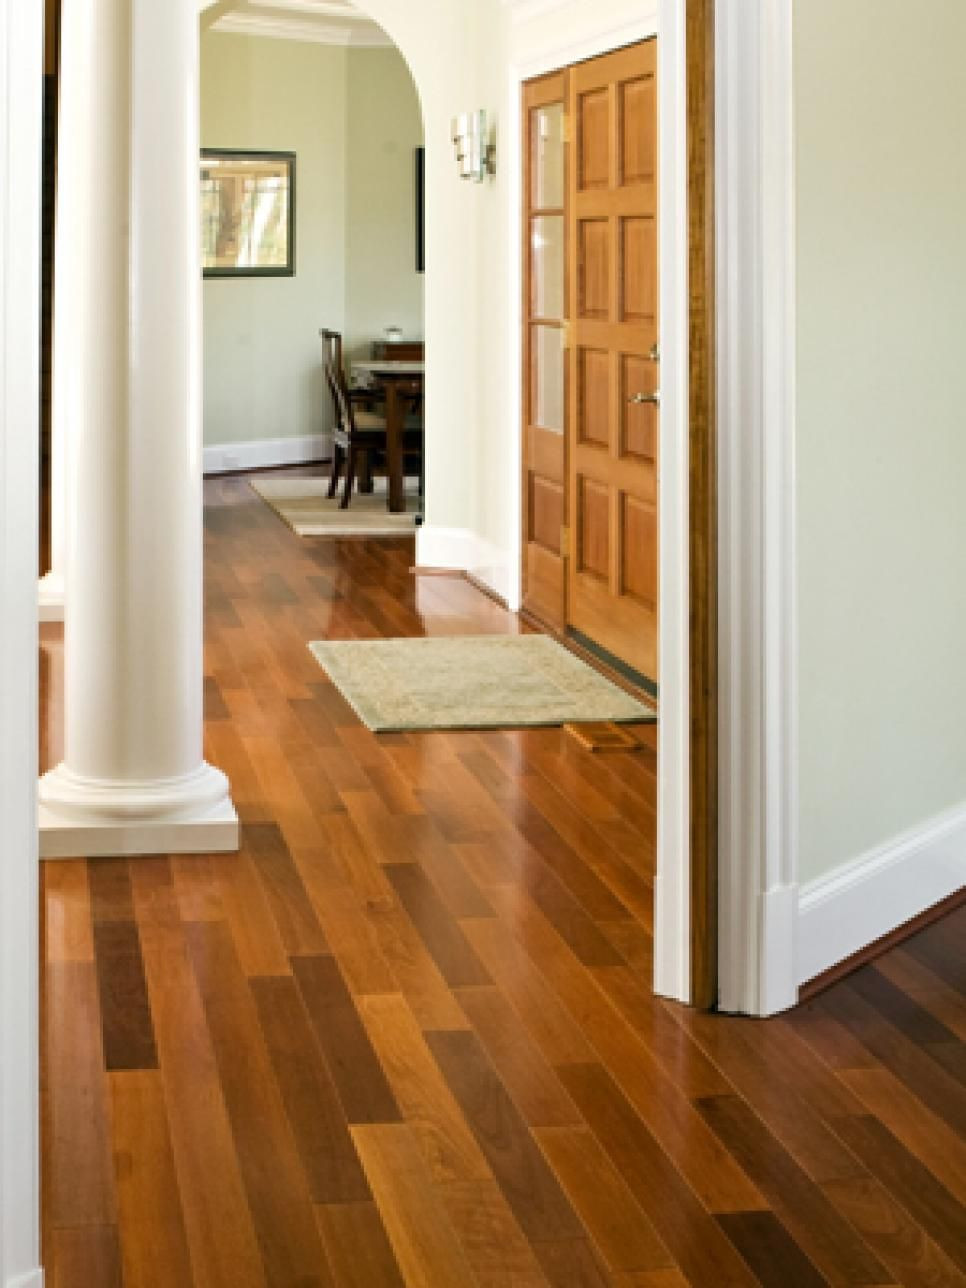 4 inch maple hardwood flooring of 10 stunning hardwood flooring options interior design styles and throughout 10 stunning hardwood flooring options interior design styles and color schemes for home decorating